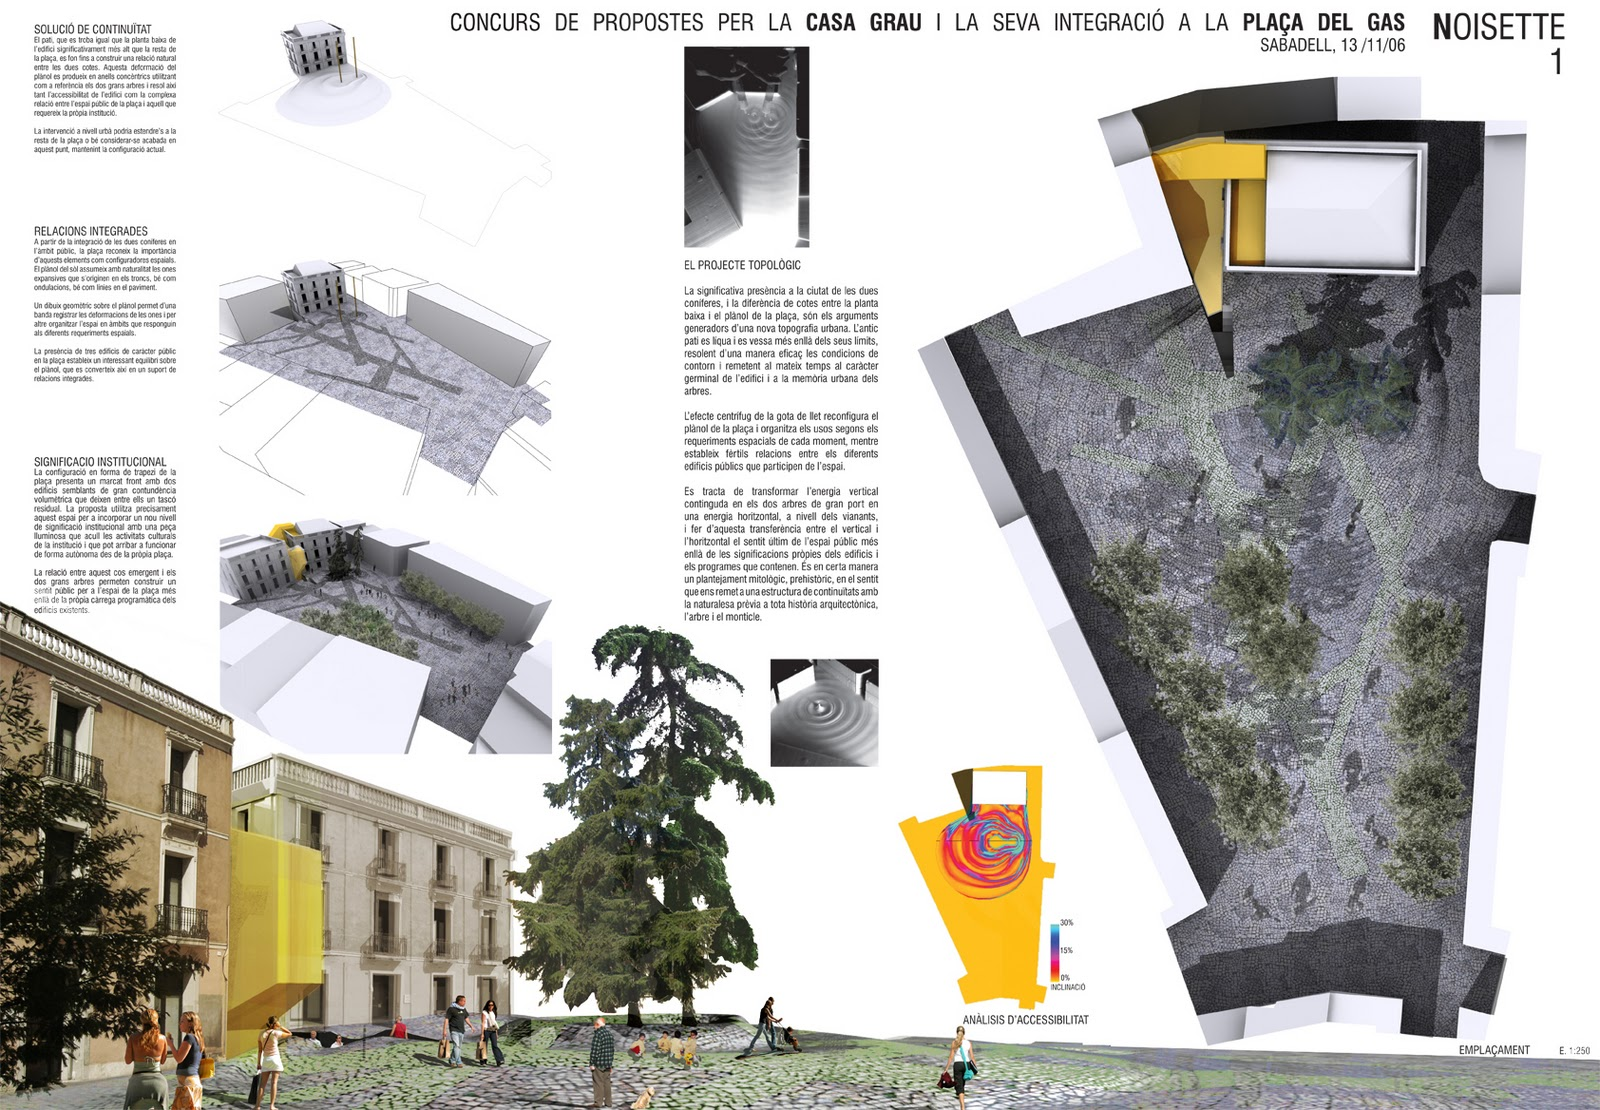 Iranzu santamaria iribas arquitecta - Arquitectos sabadell ...